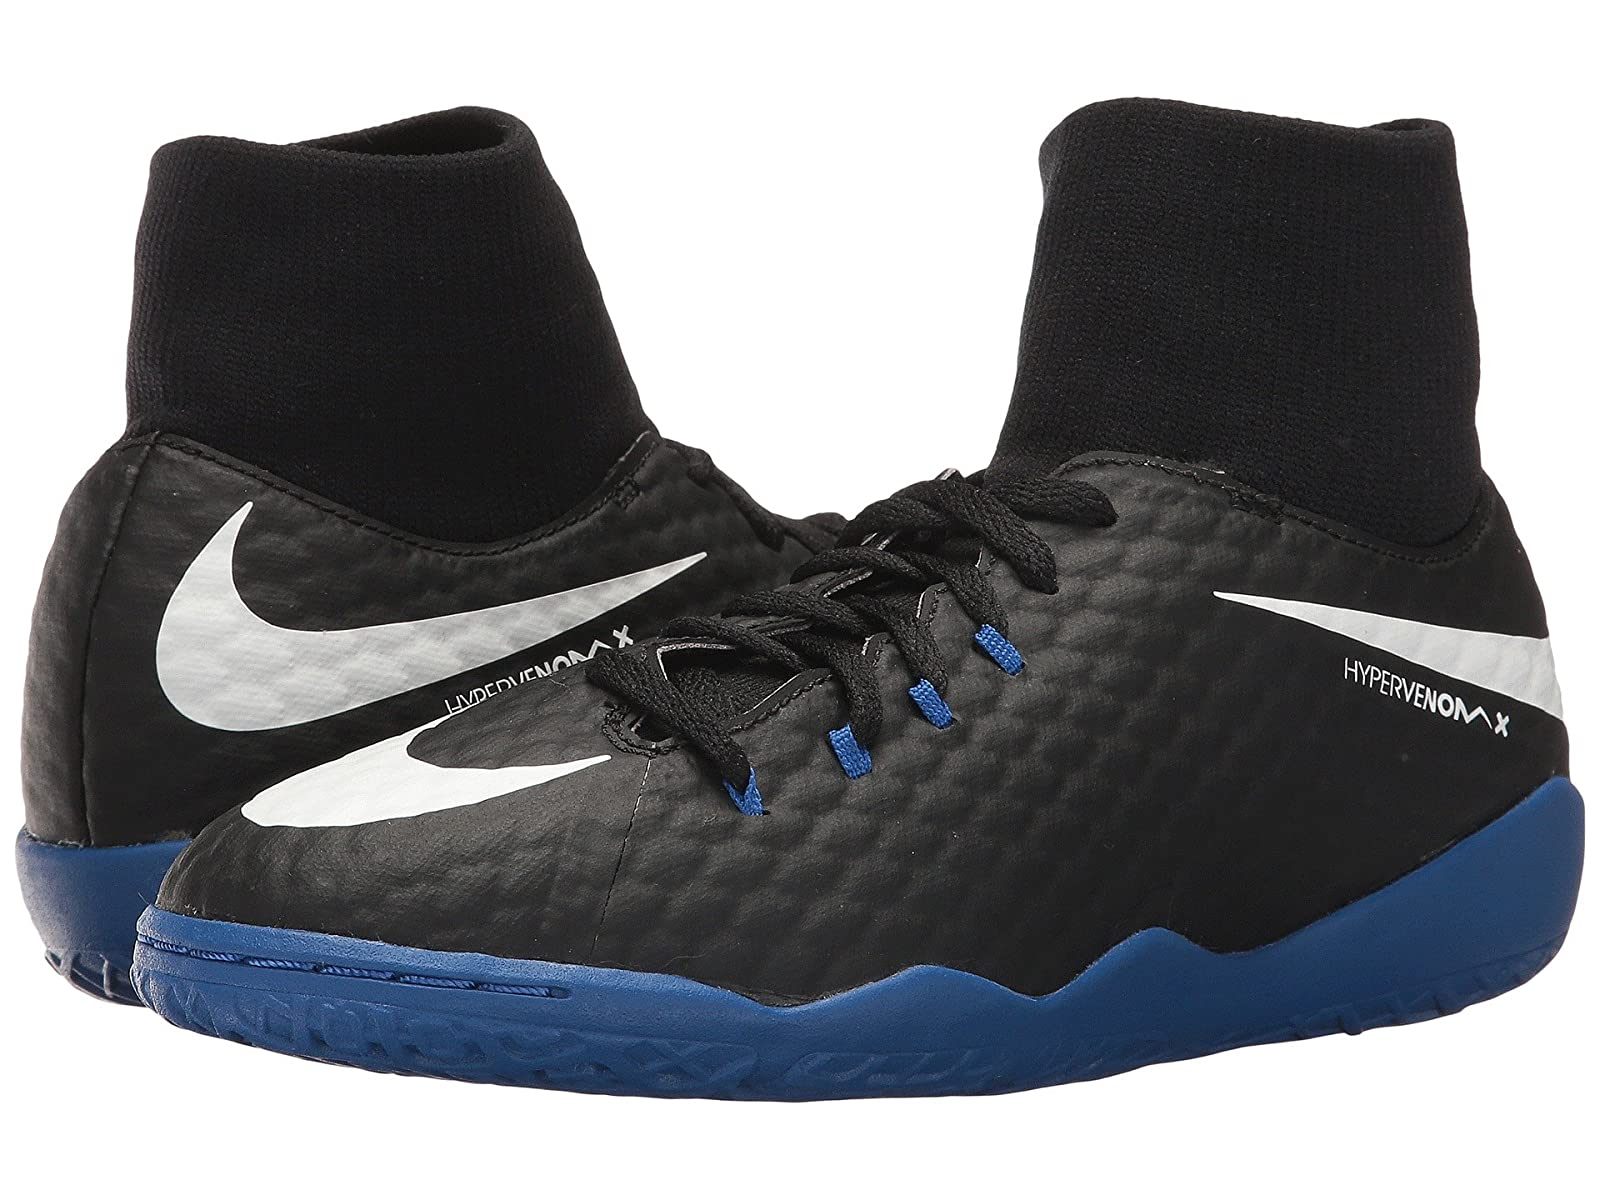 Man's/Woman's: III Nike Kids HypervenomX Phelon III Man's/Woman's: Dynamic Fit IC Soccer Shoe (Little Kid/Big Kid) : Diversified ED Pack 6cfdea